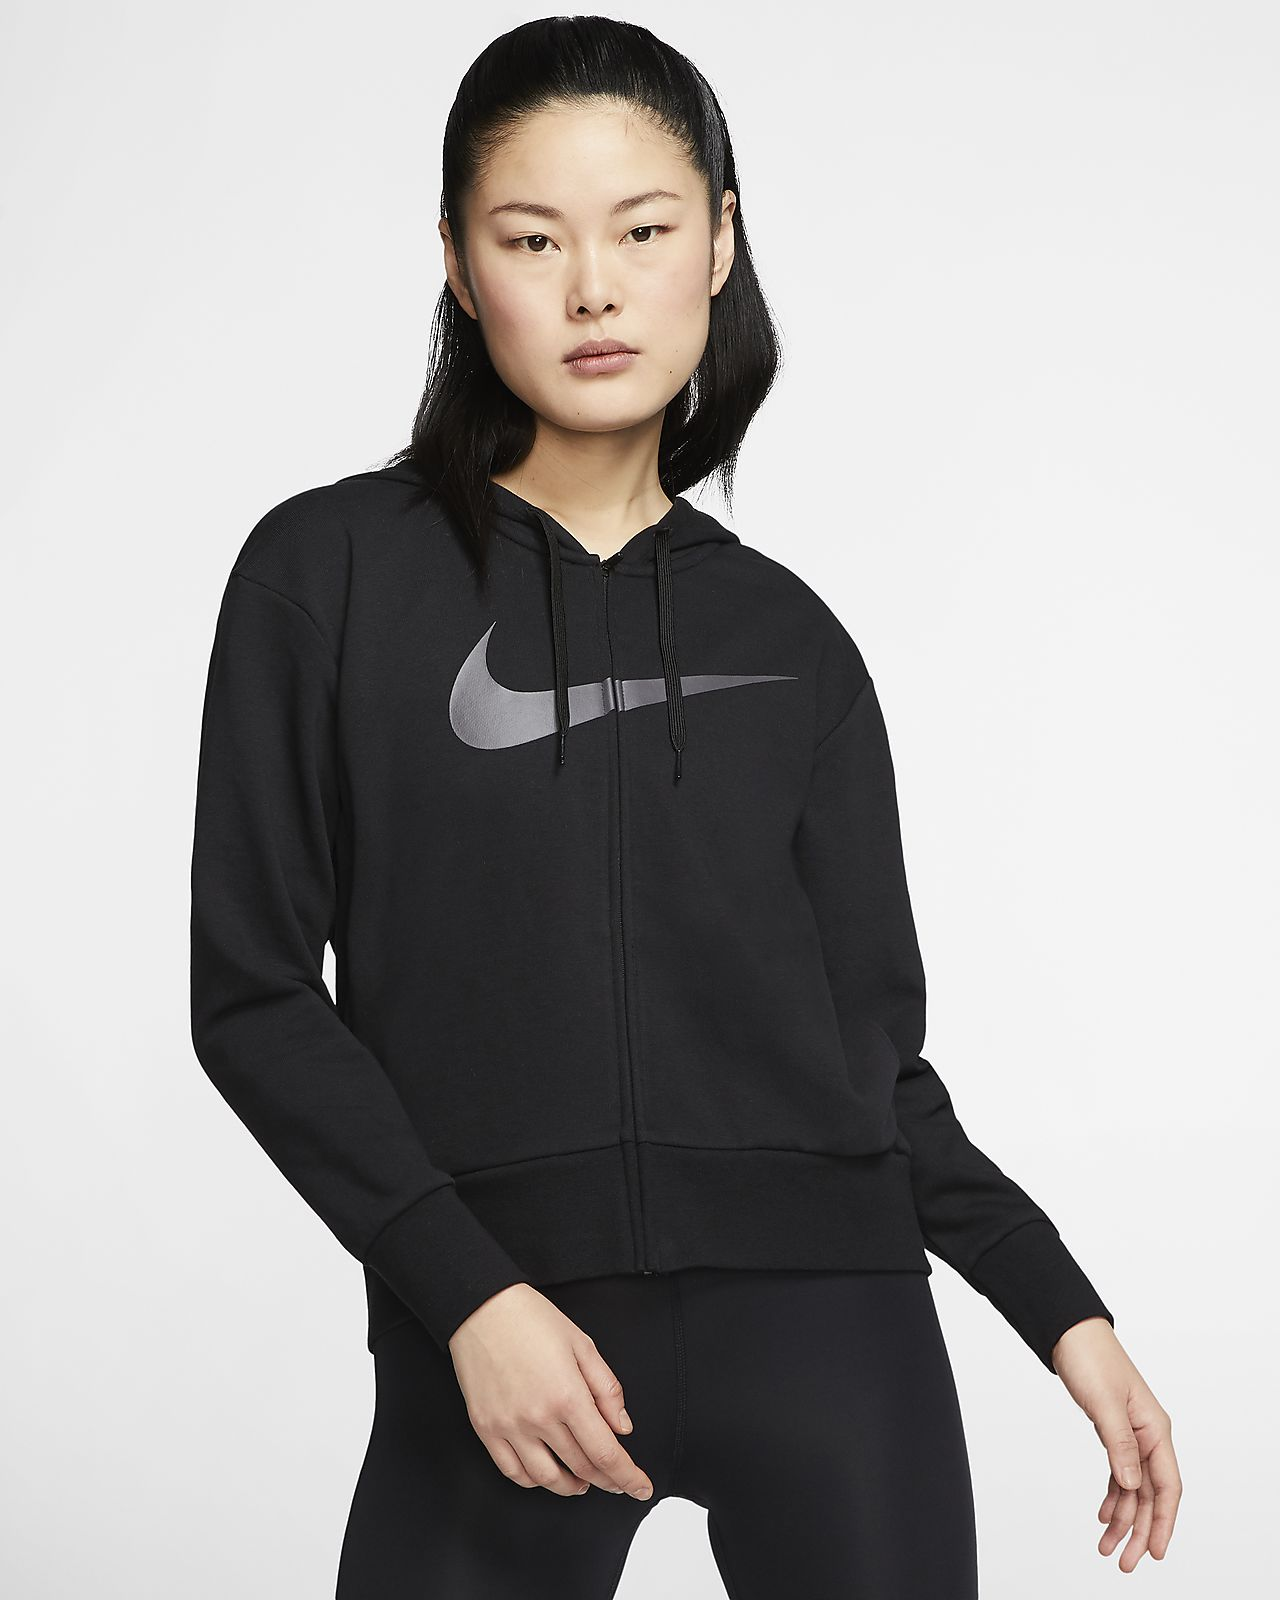 Nike Dri FIT Get Fit Women's Full Zip Training Hoodie